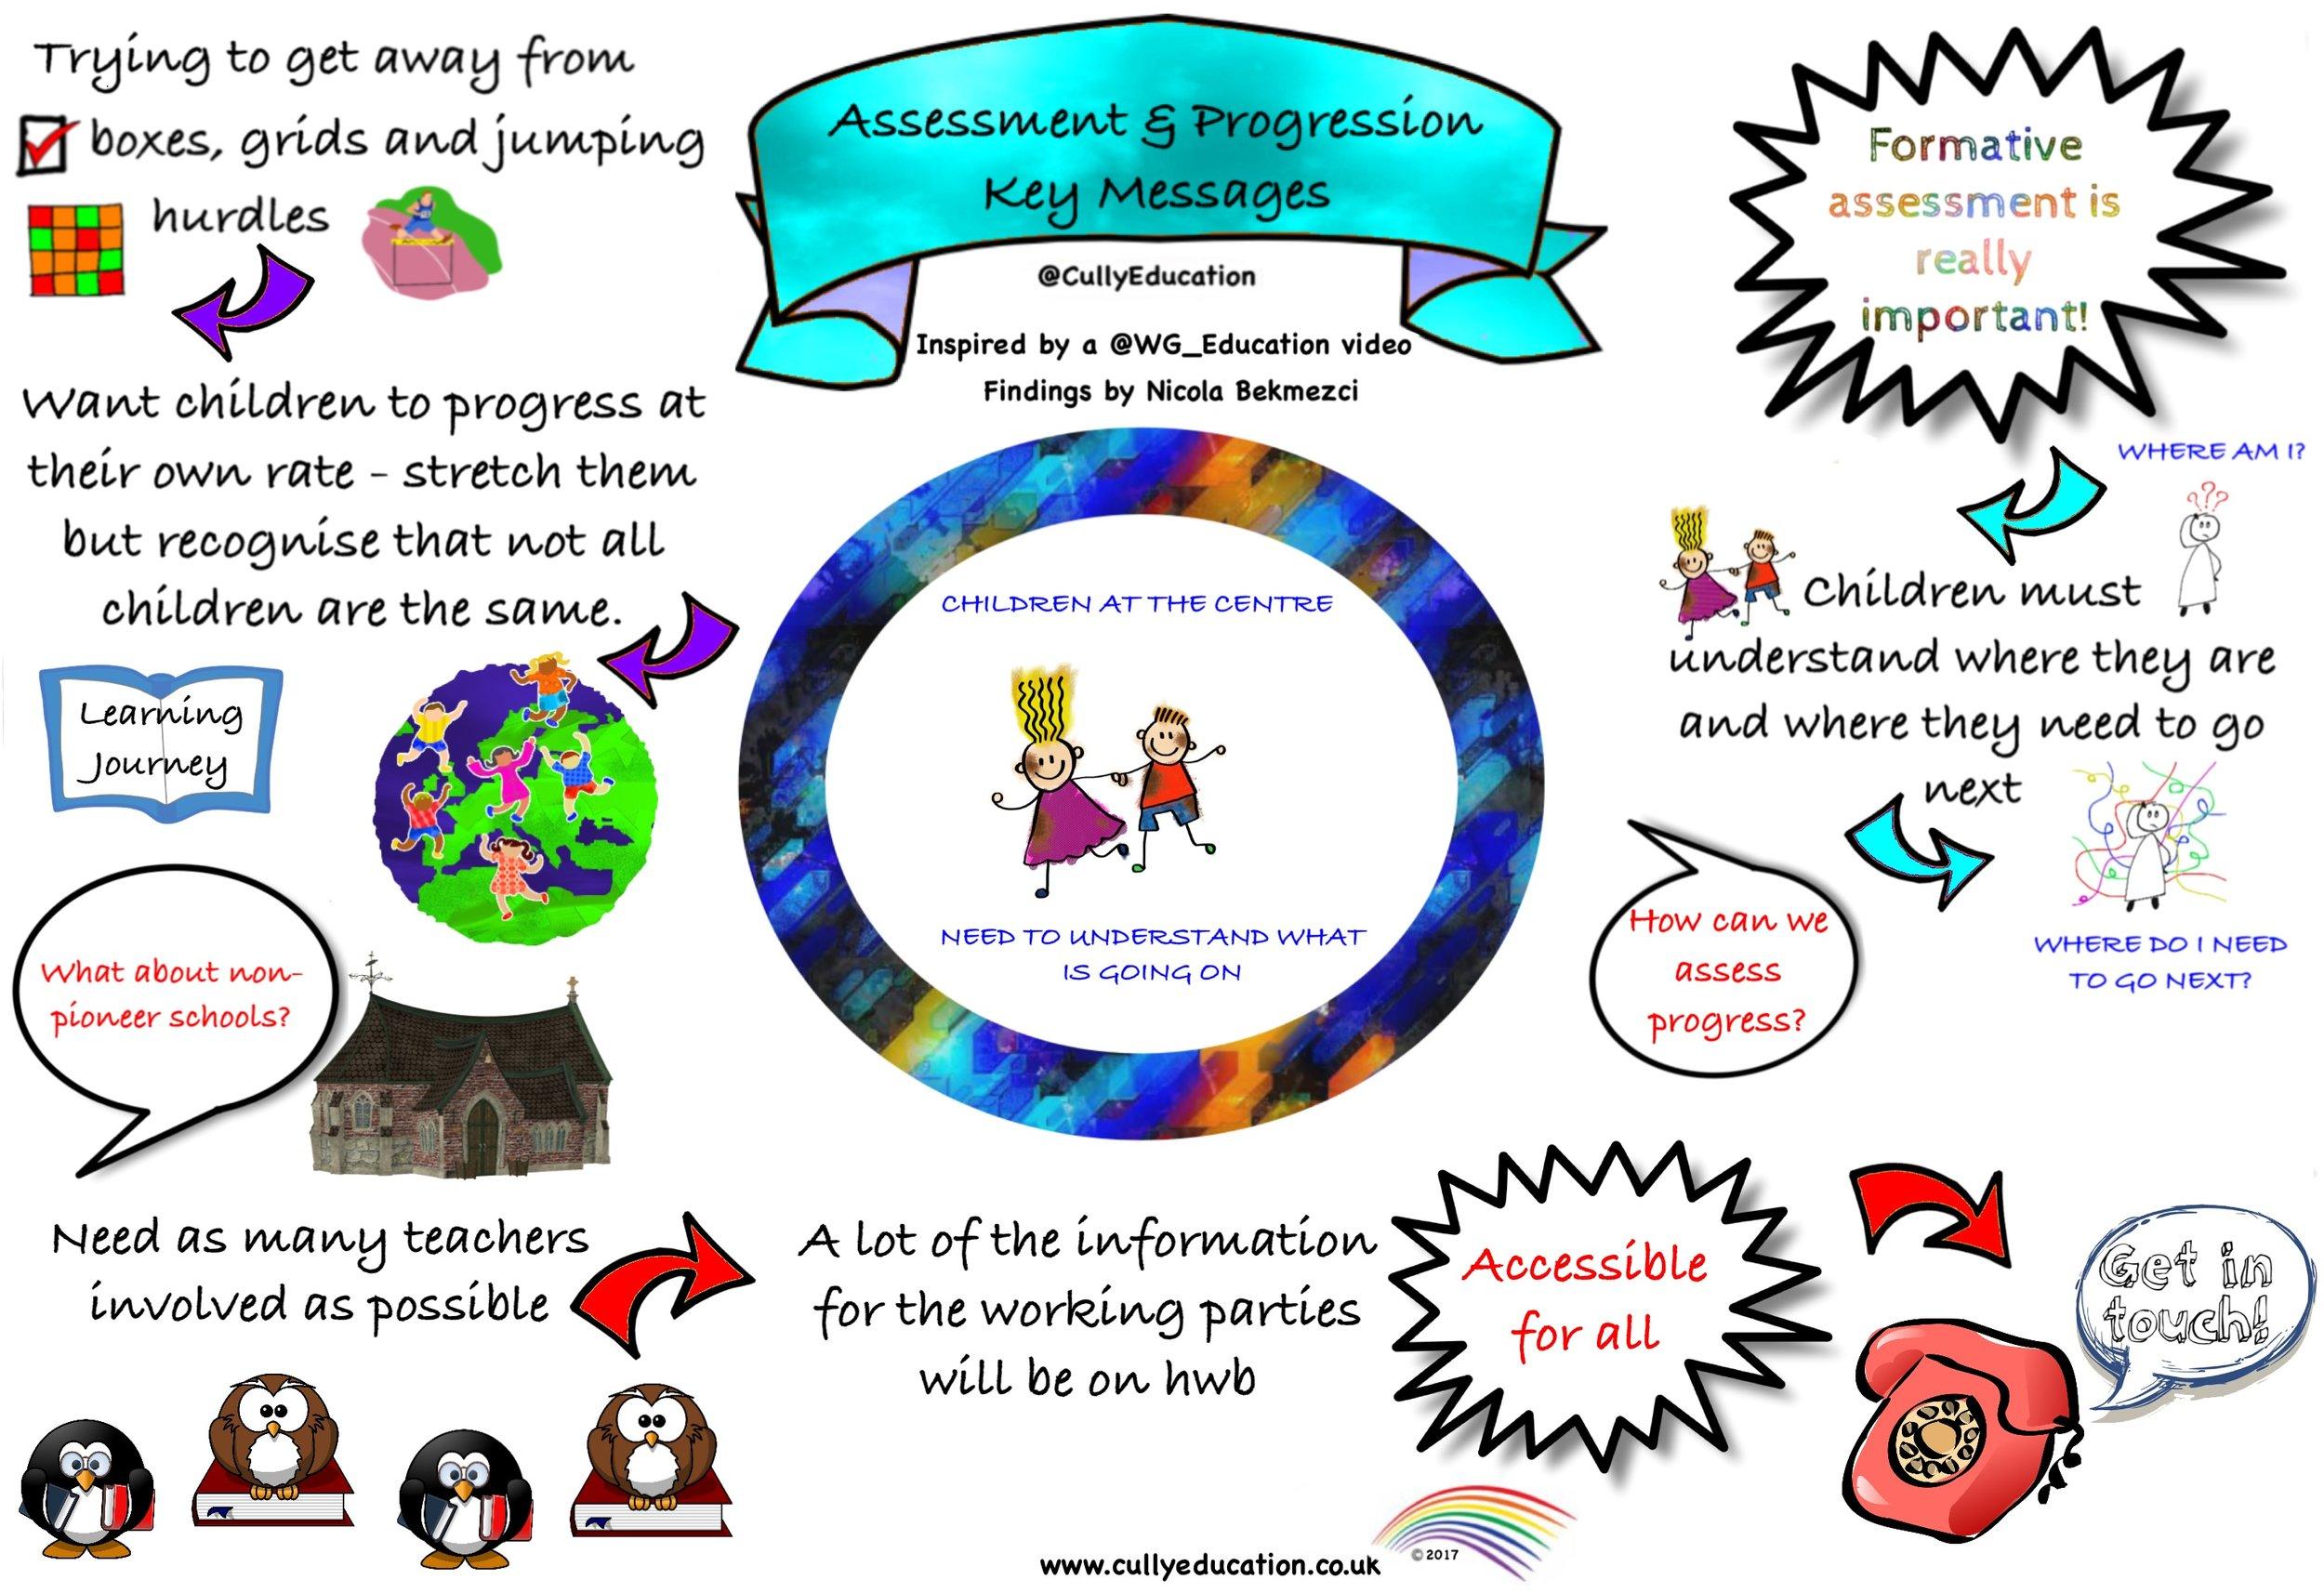 Assessment & Progression Key Messages